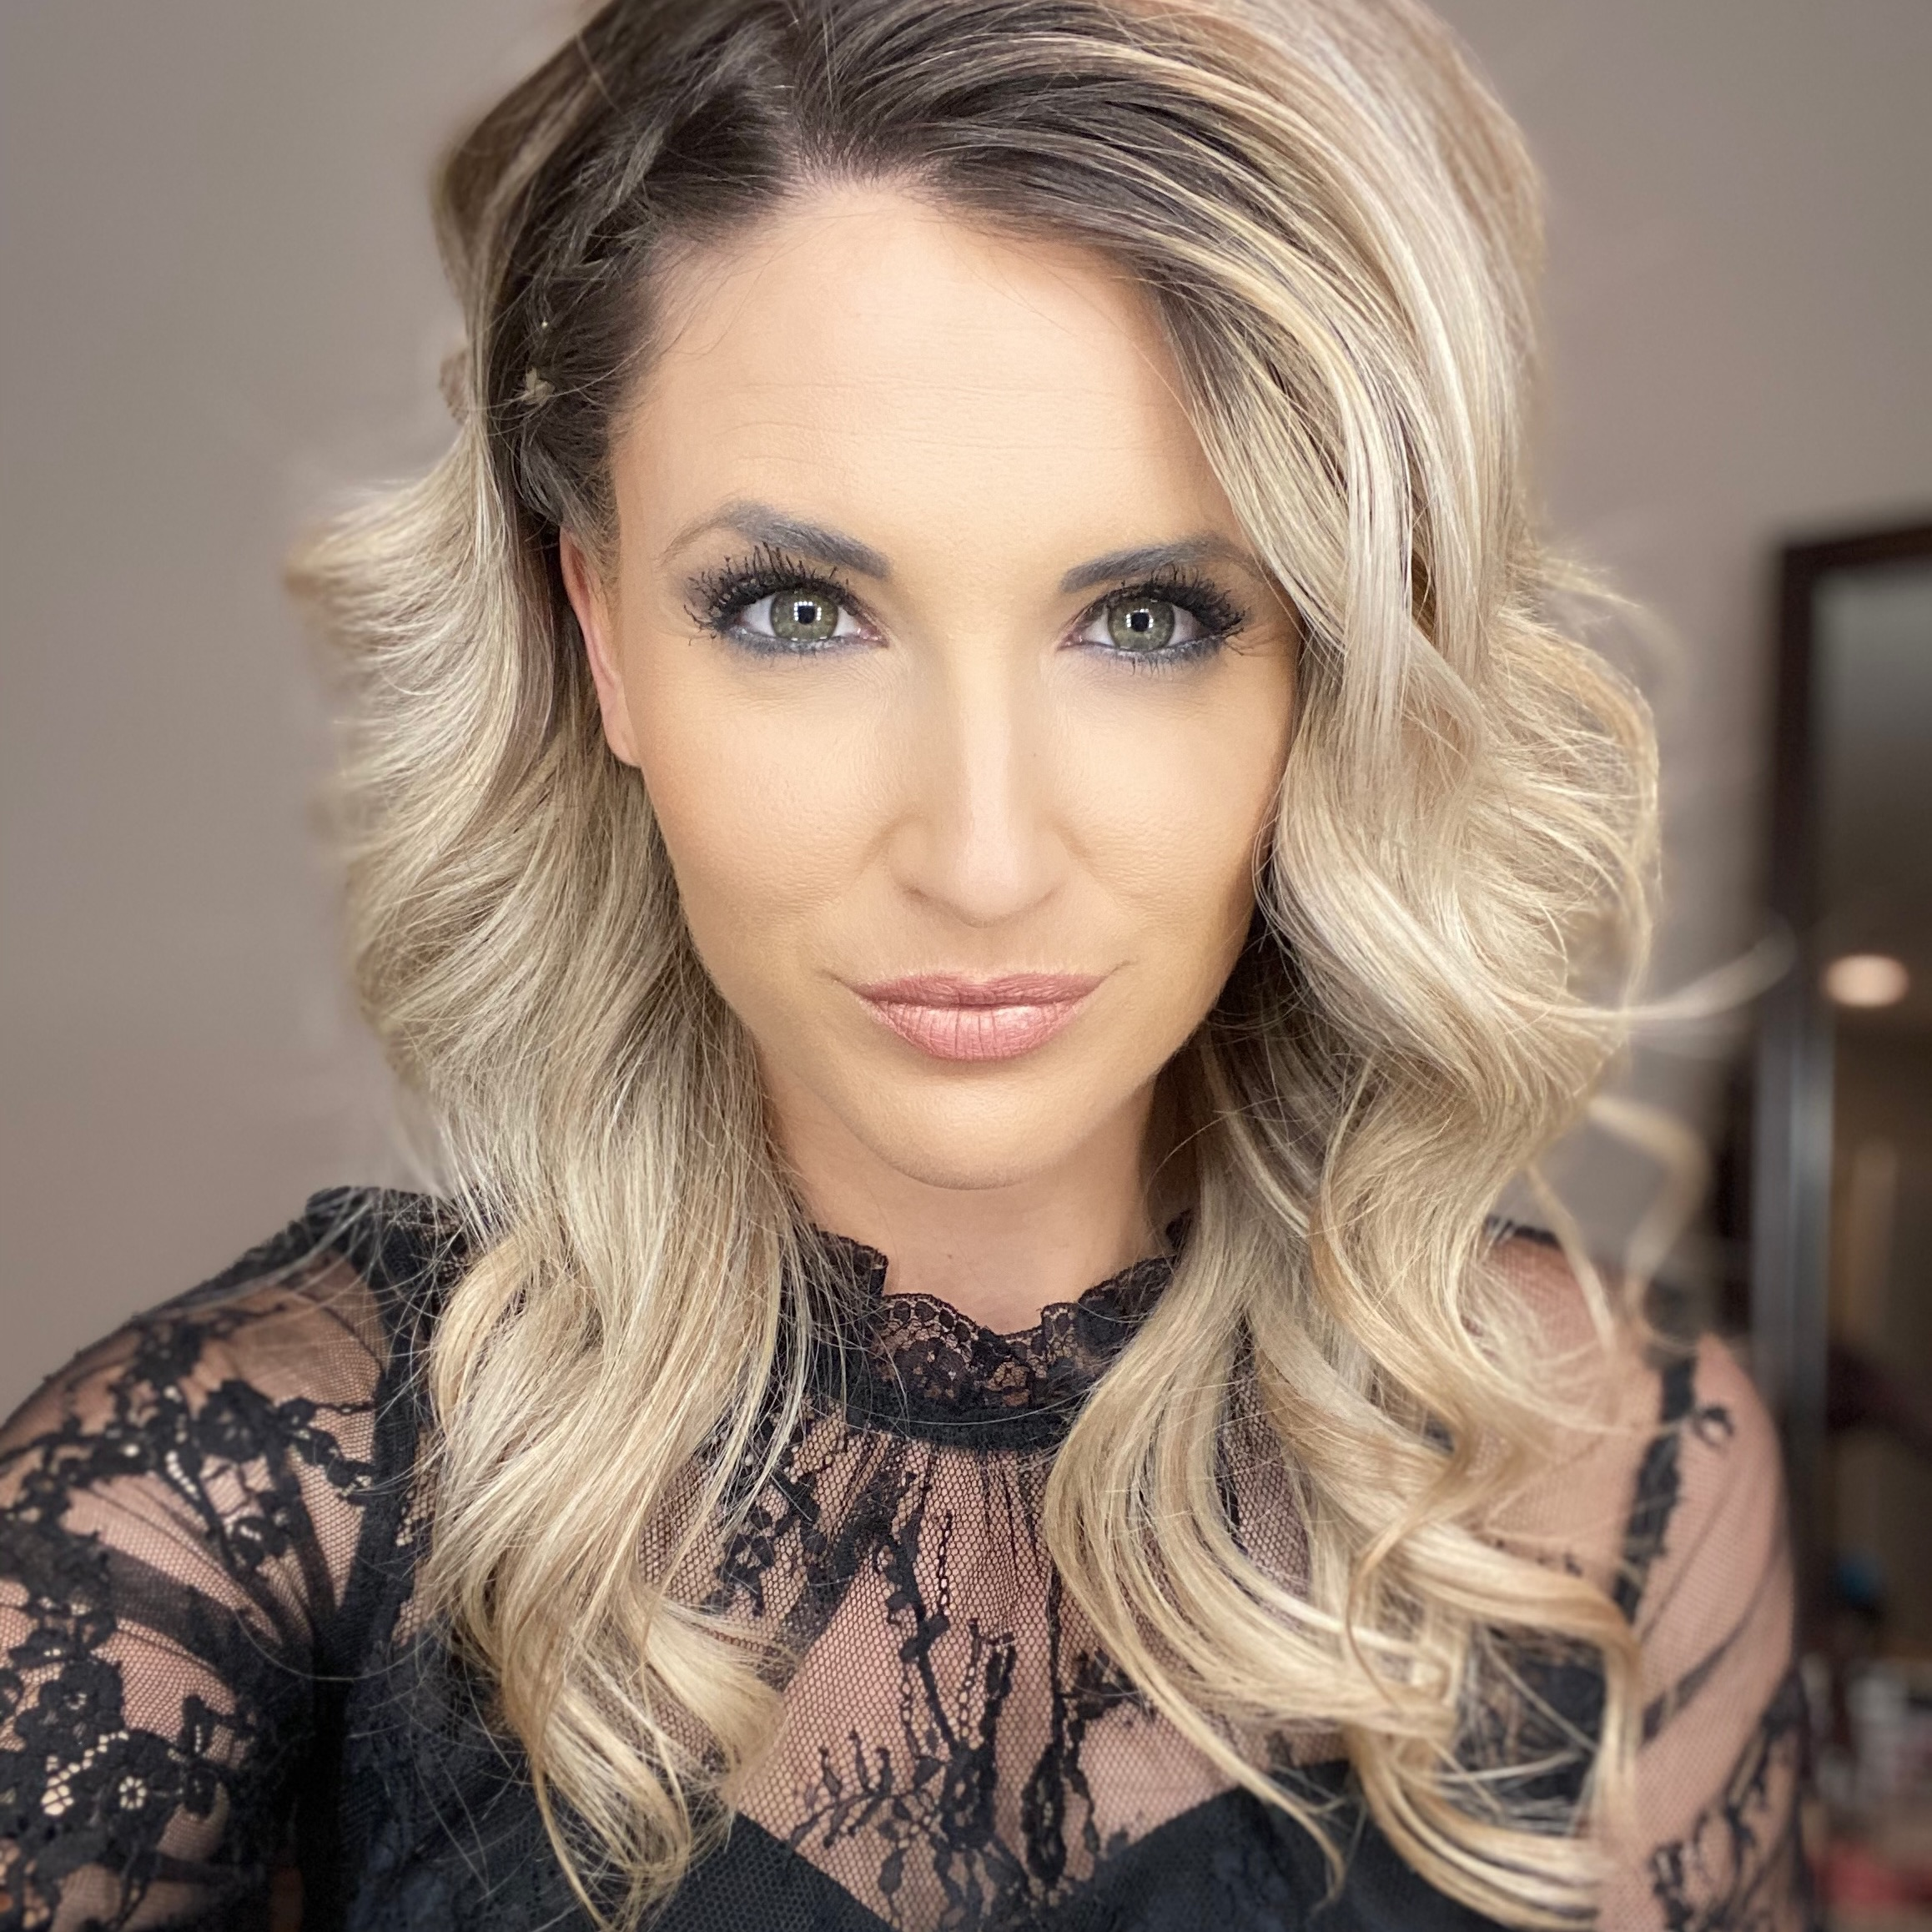 @mrs_agw Profile Image | Linktree